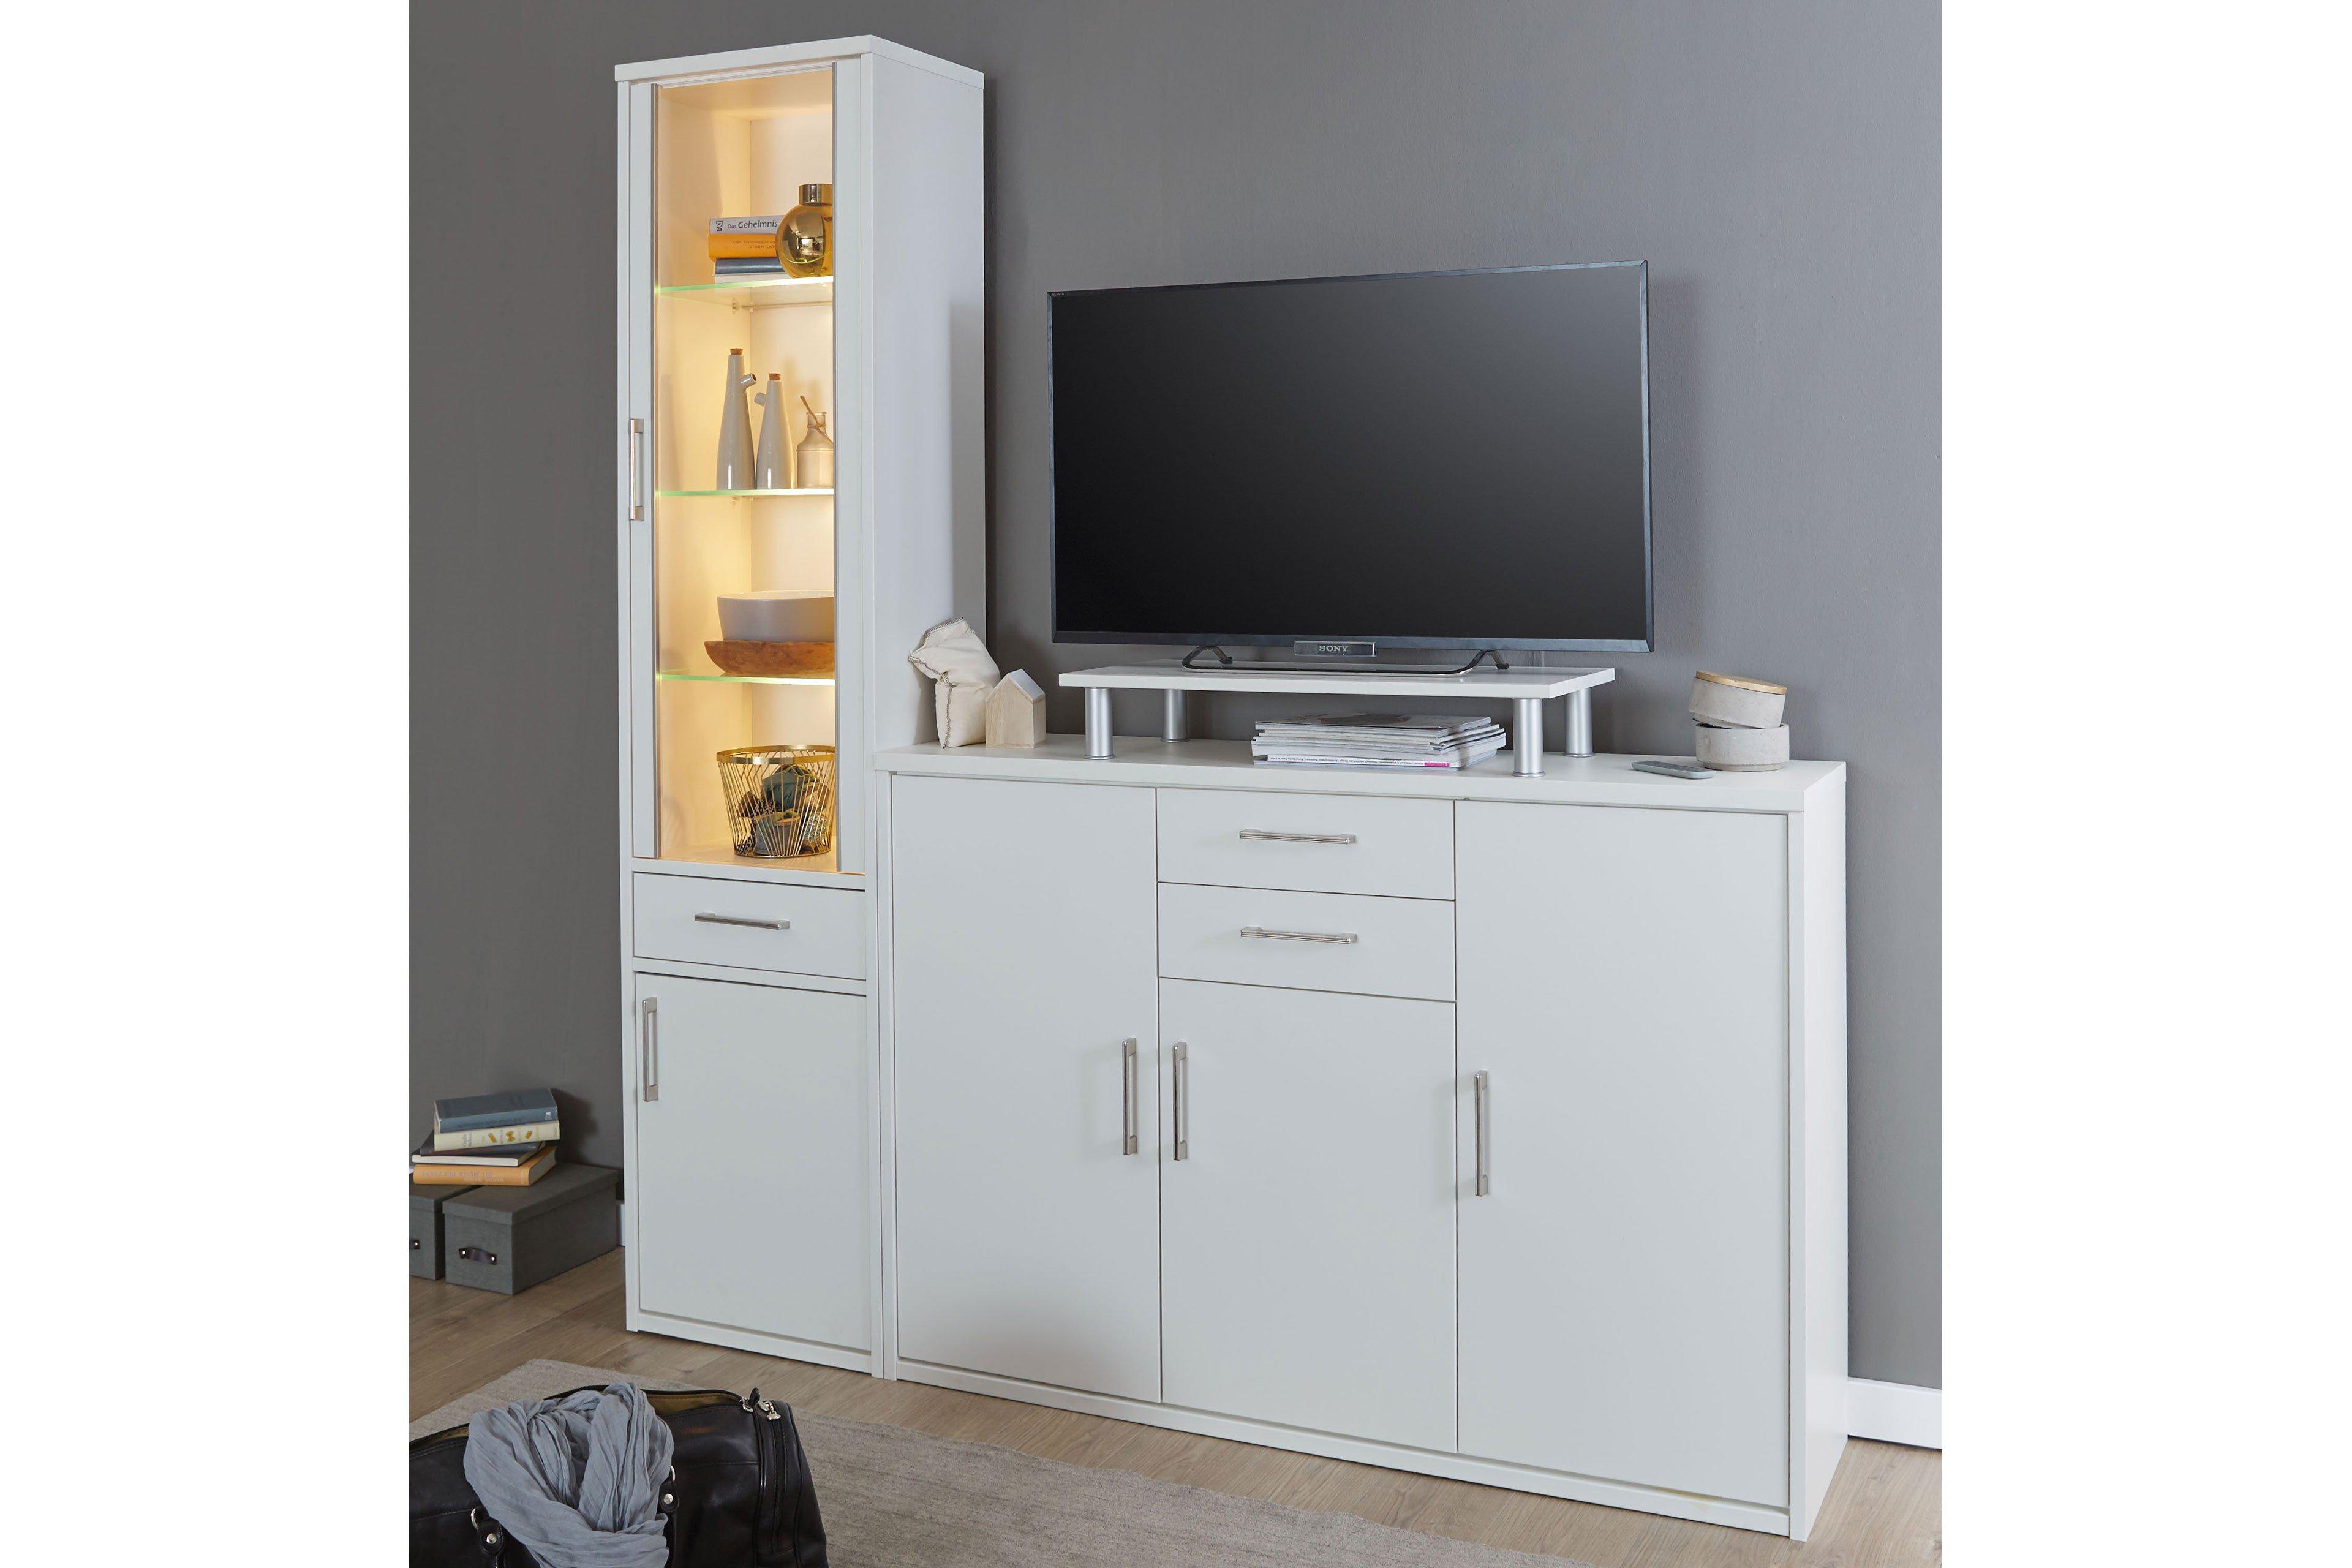 mbel preiss online shop cool houston von poco with mbel preiss online shop cool gutschein fr. Black Bedroom Furniture Sets. Home Design Ideas